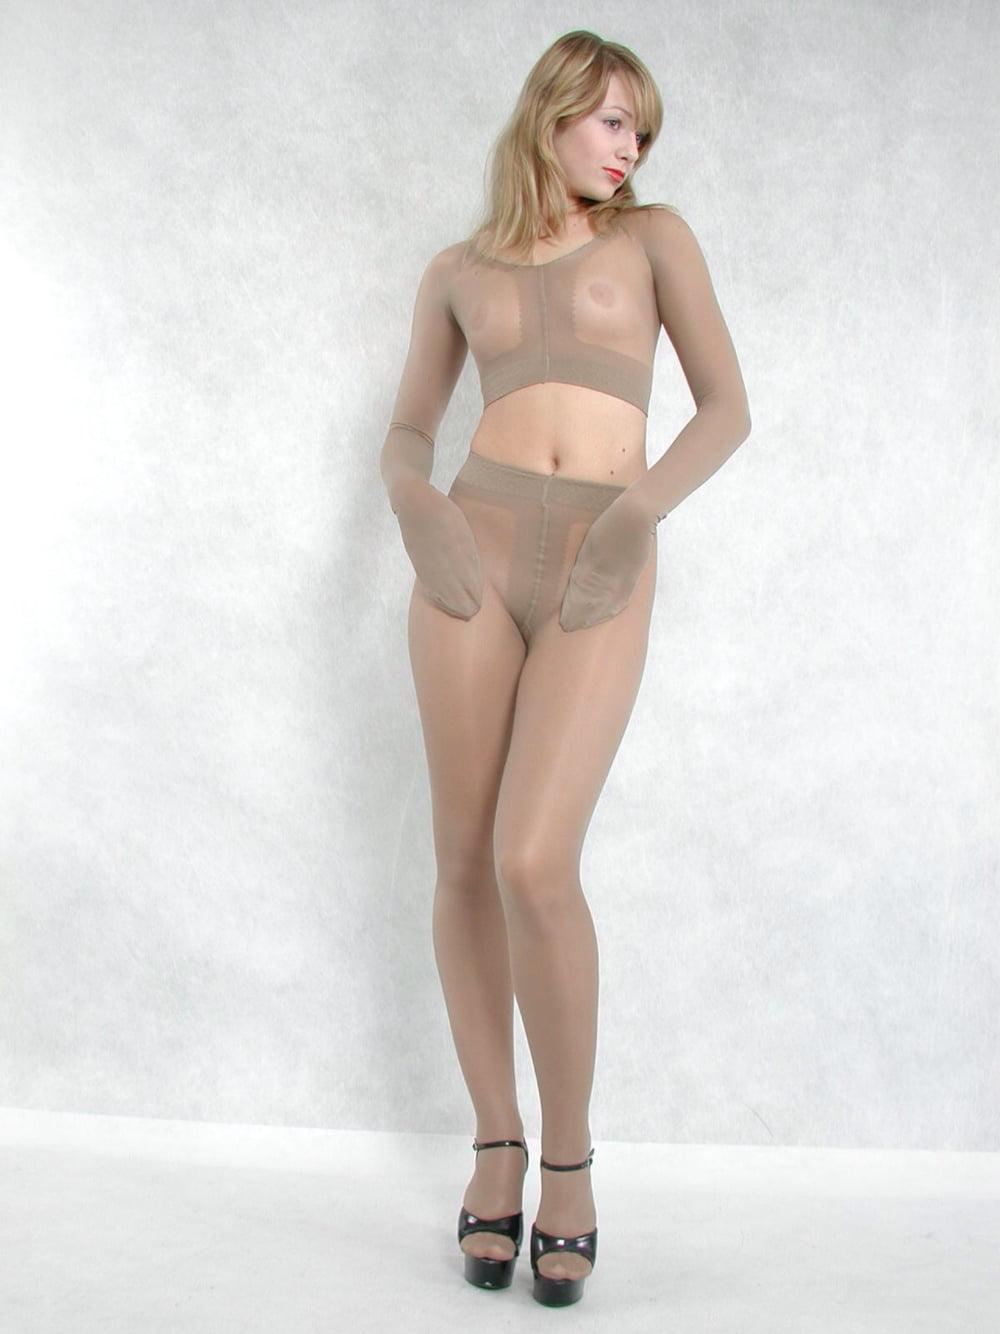 Pantyhose encasement porn-4751